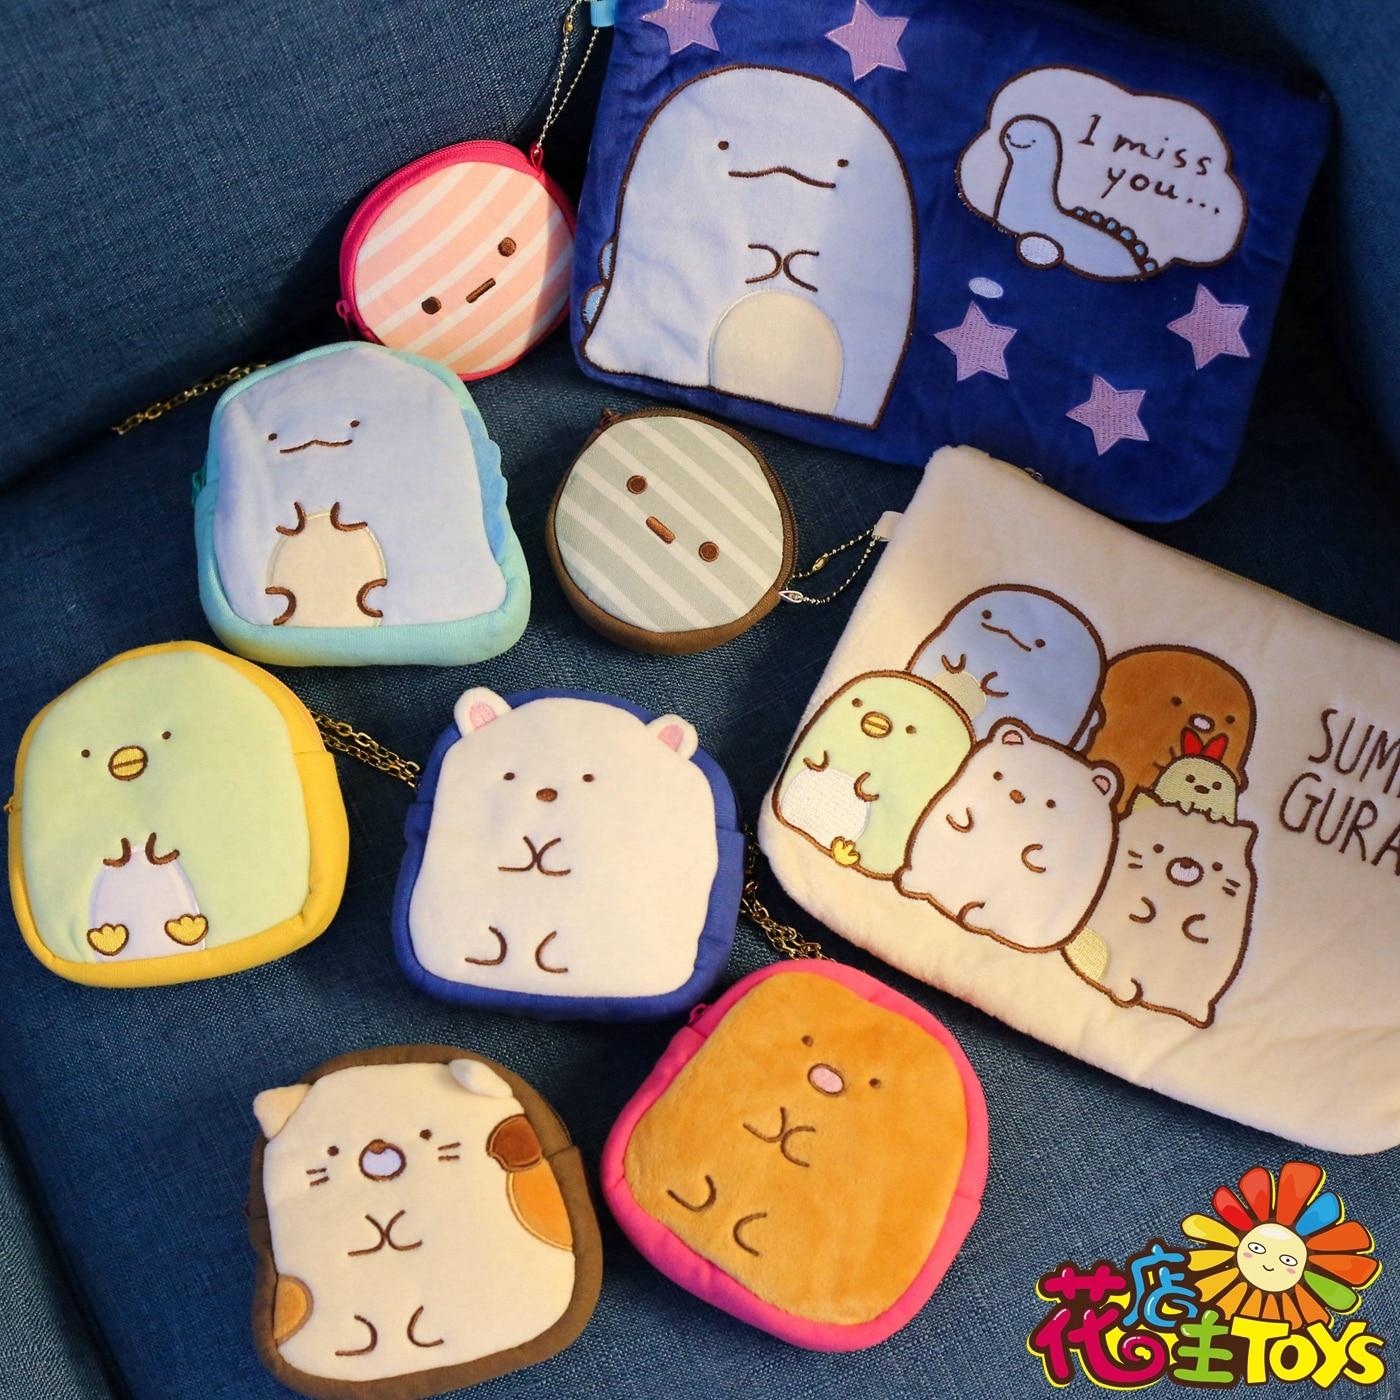 1 Pc San-X Kawaii Japan Corner Biology Plush Coin Purse Japanese Animation Sumikko Gurashi Animal Cartoon Bag Plush Toys